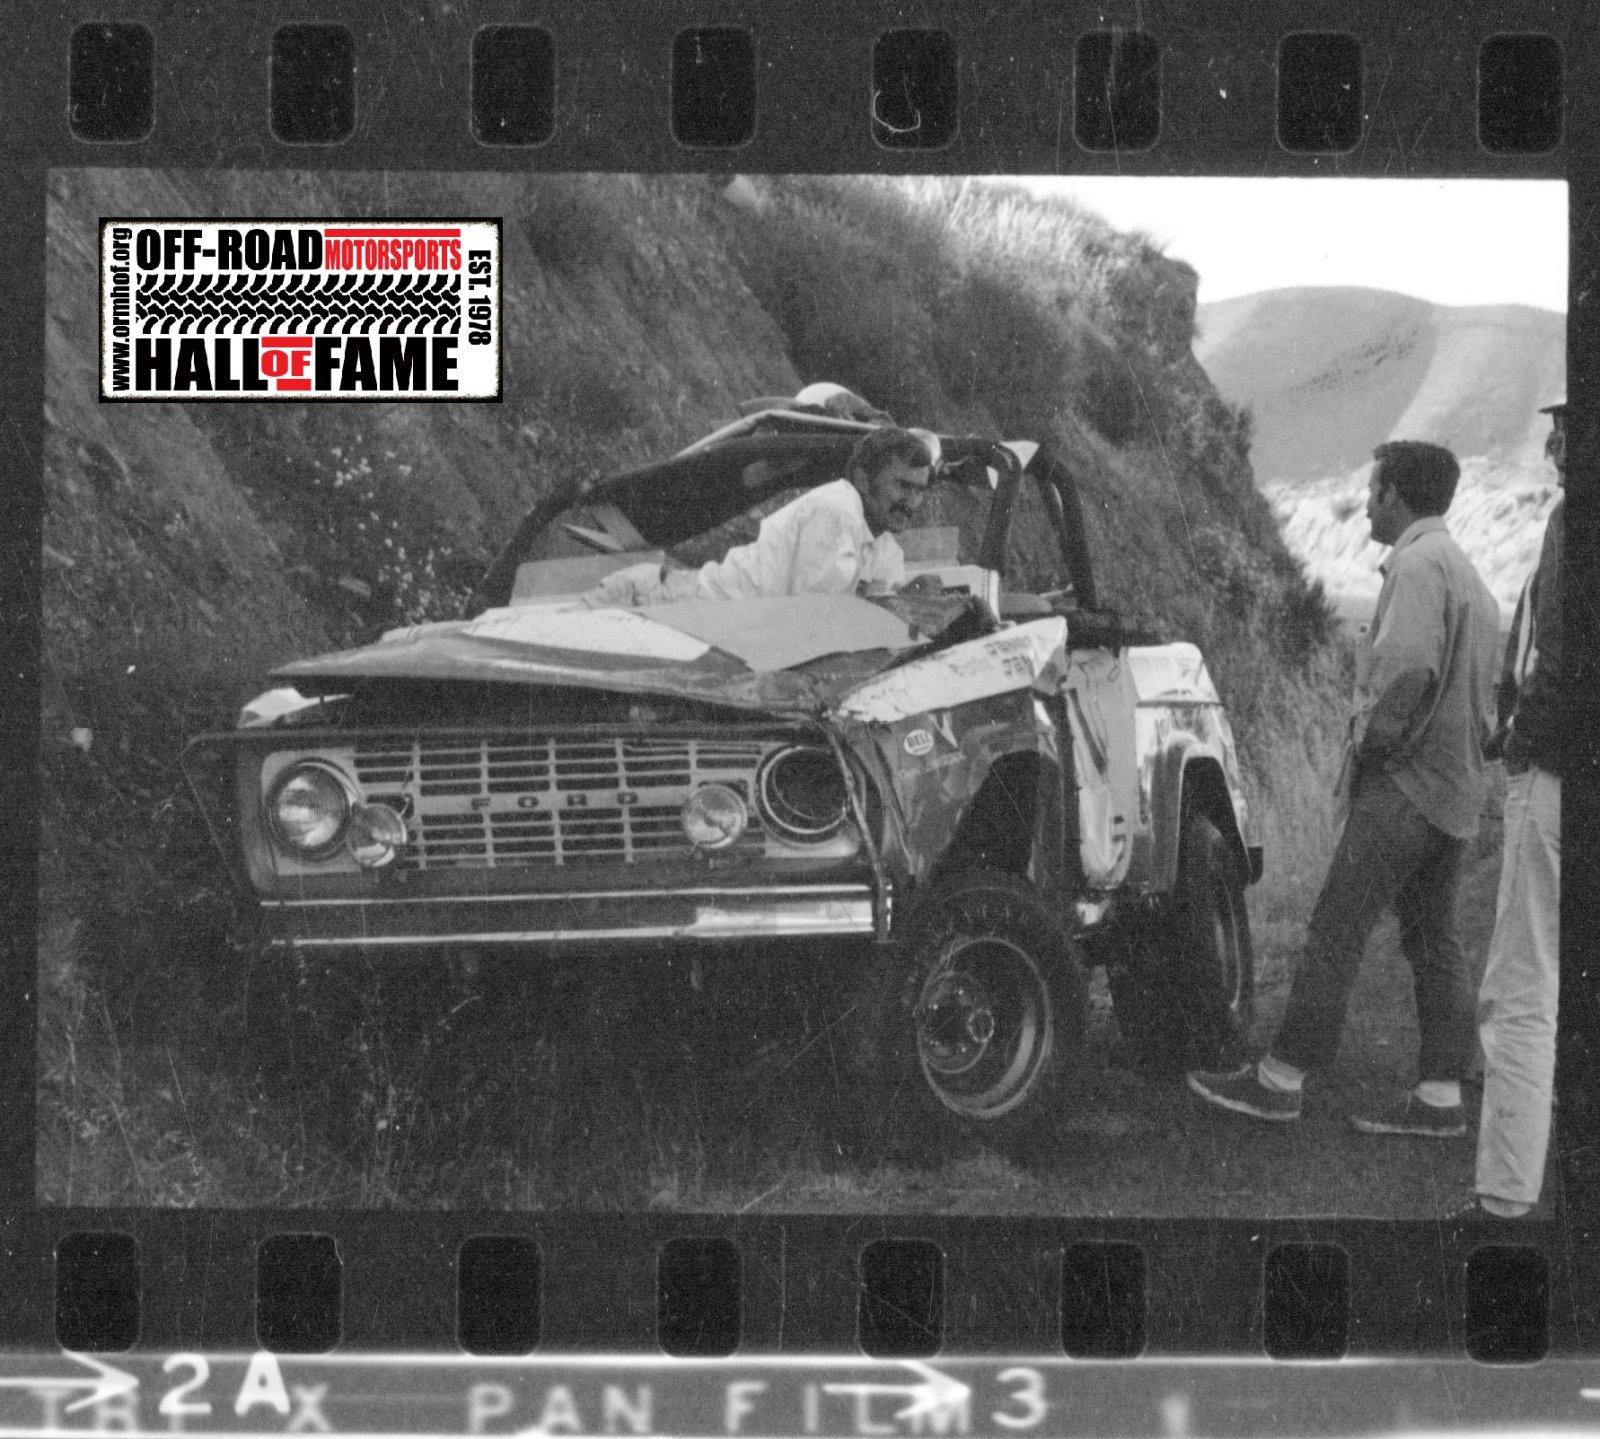 Dusty Times Bronco Wreck Baja 500 1969.jpg